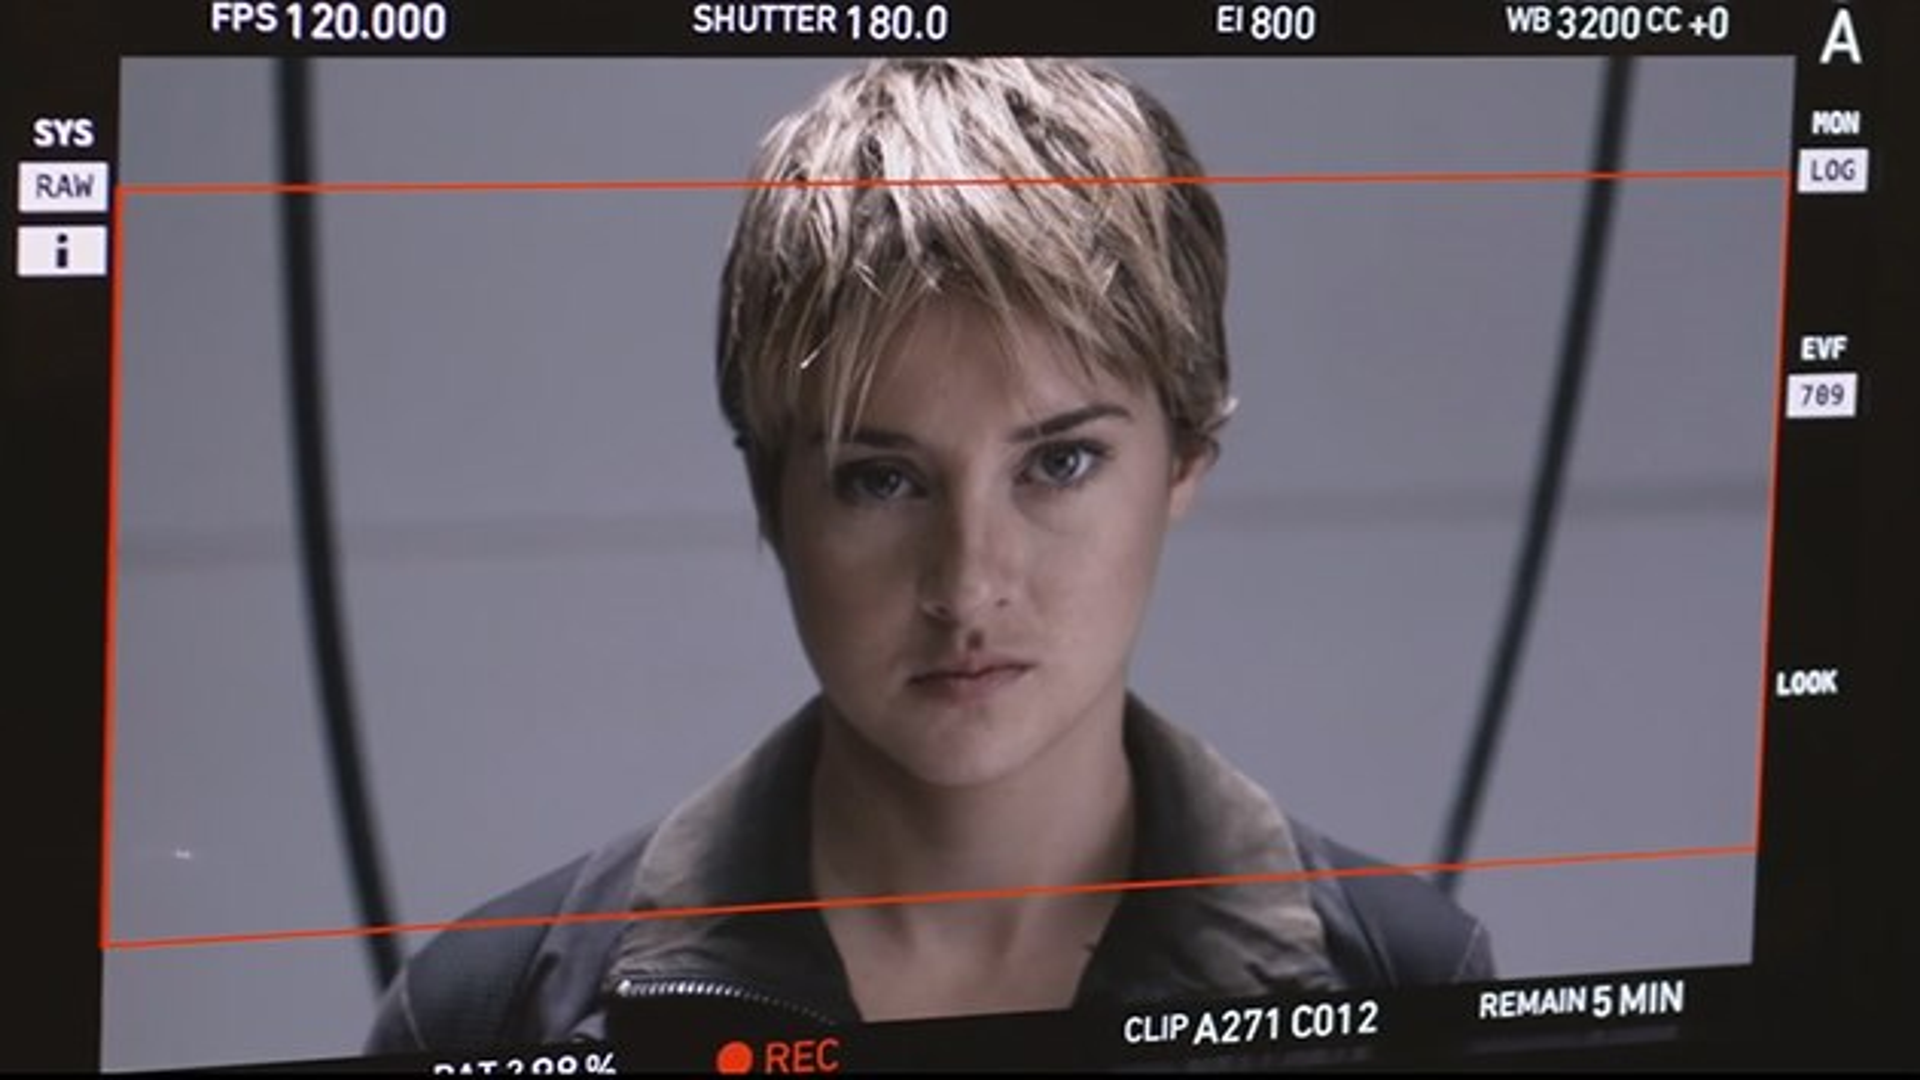 Insurgent-Shailene-Woodley-BTS